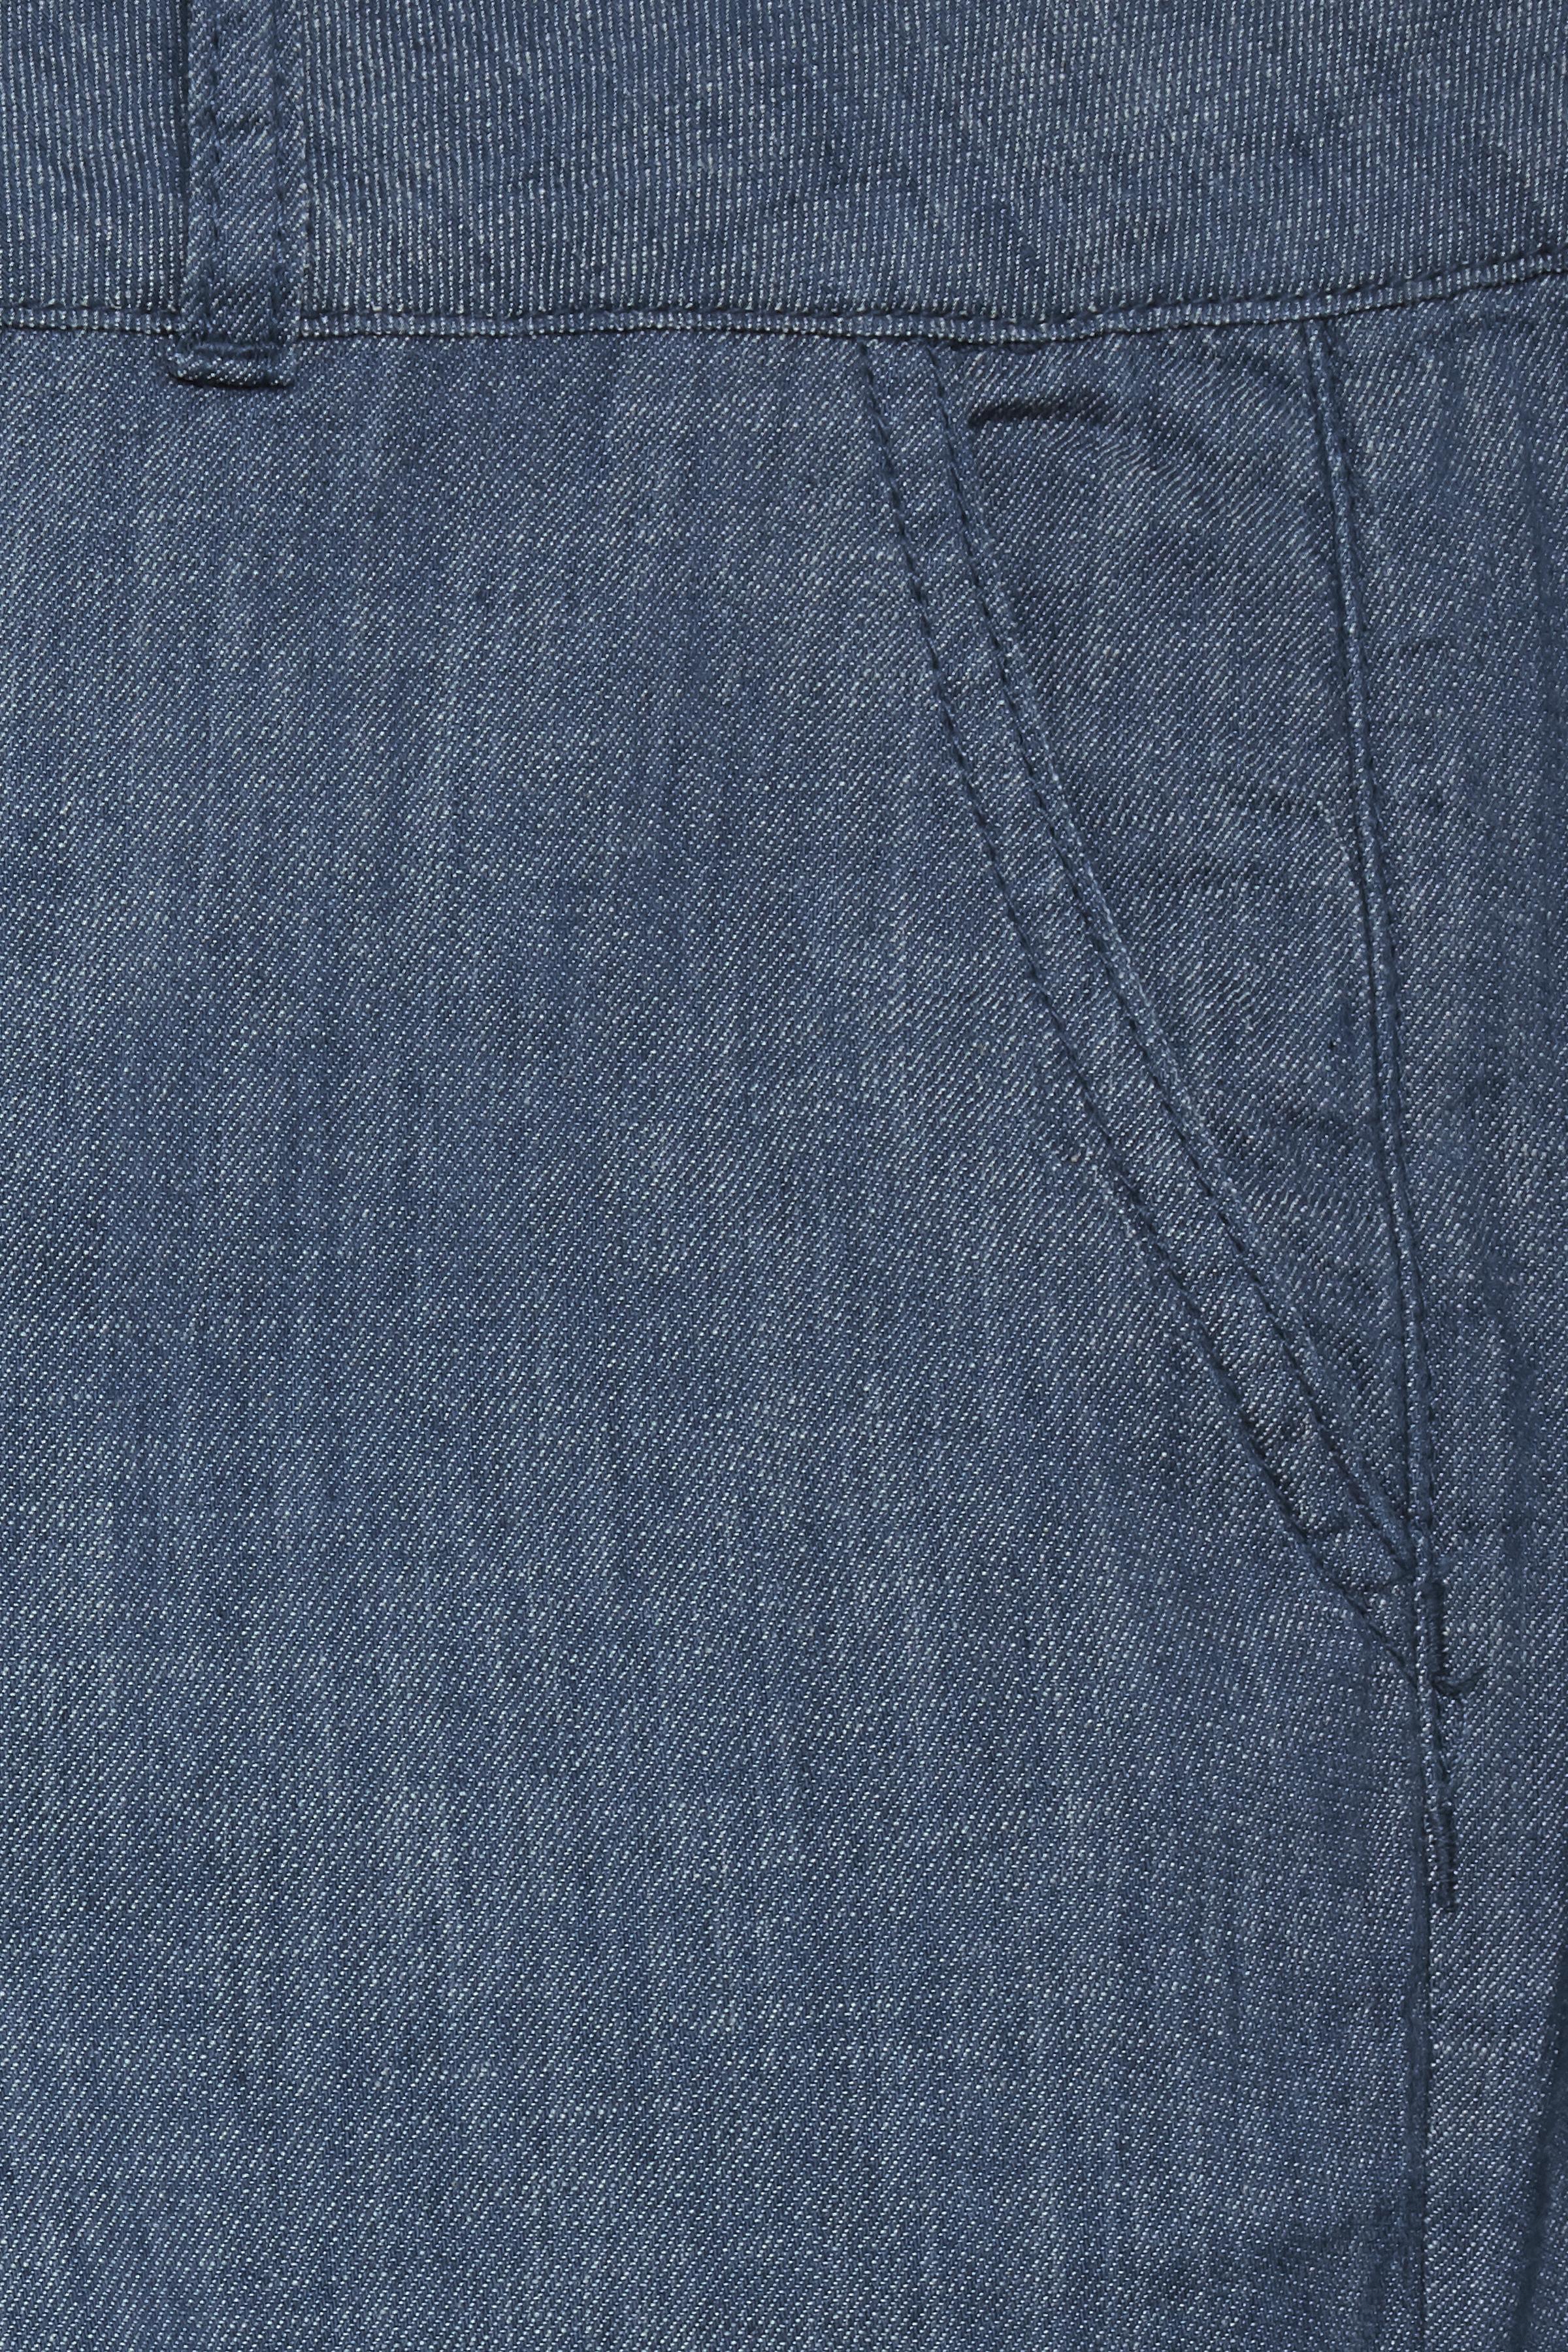 Denimblau Knöchelhose von Fransa – Shoppen SieDenimblau Knöchelhose ab Gr. 34-46 hier